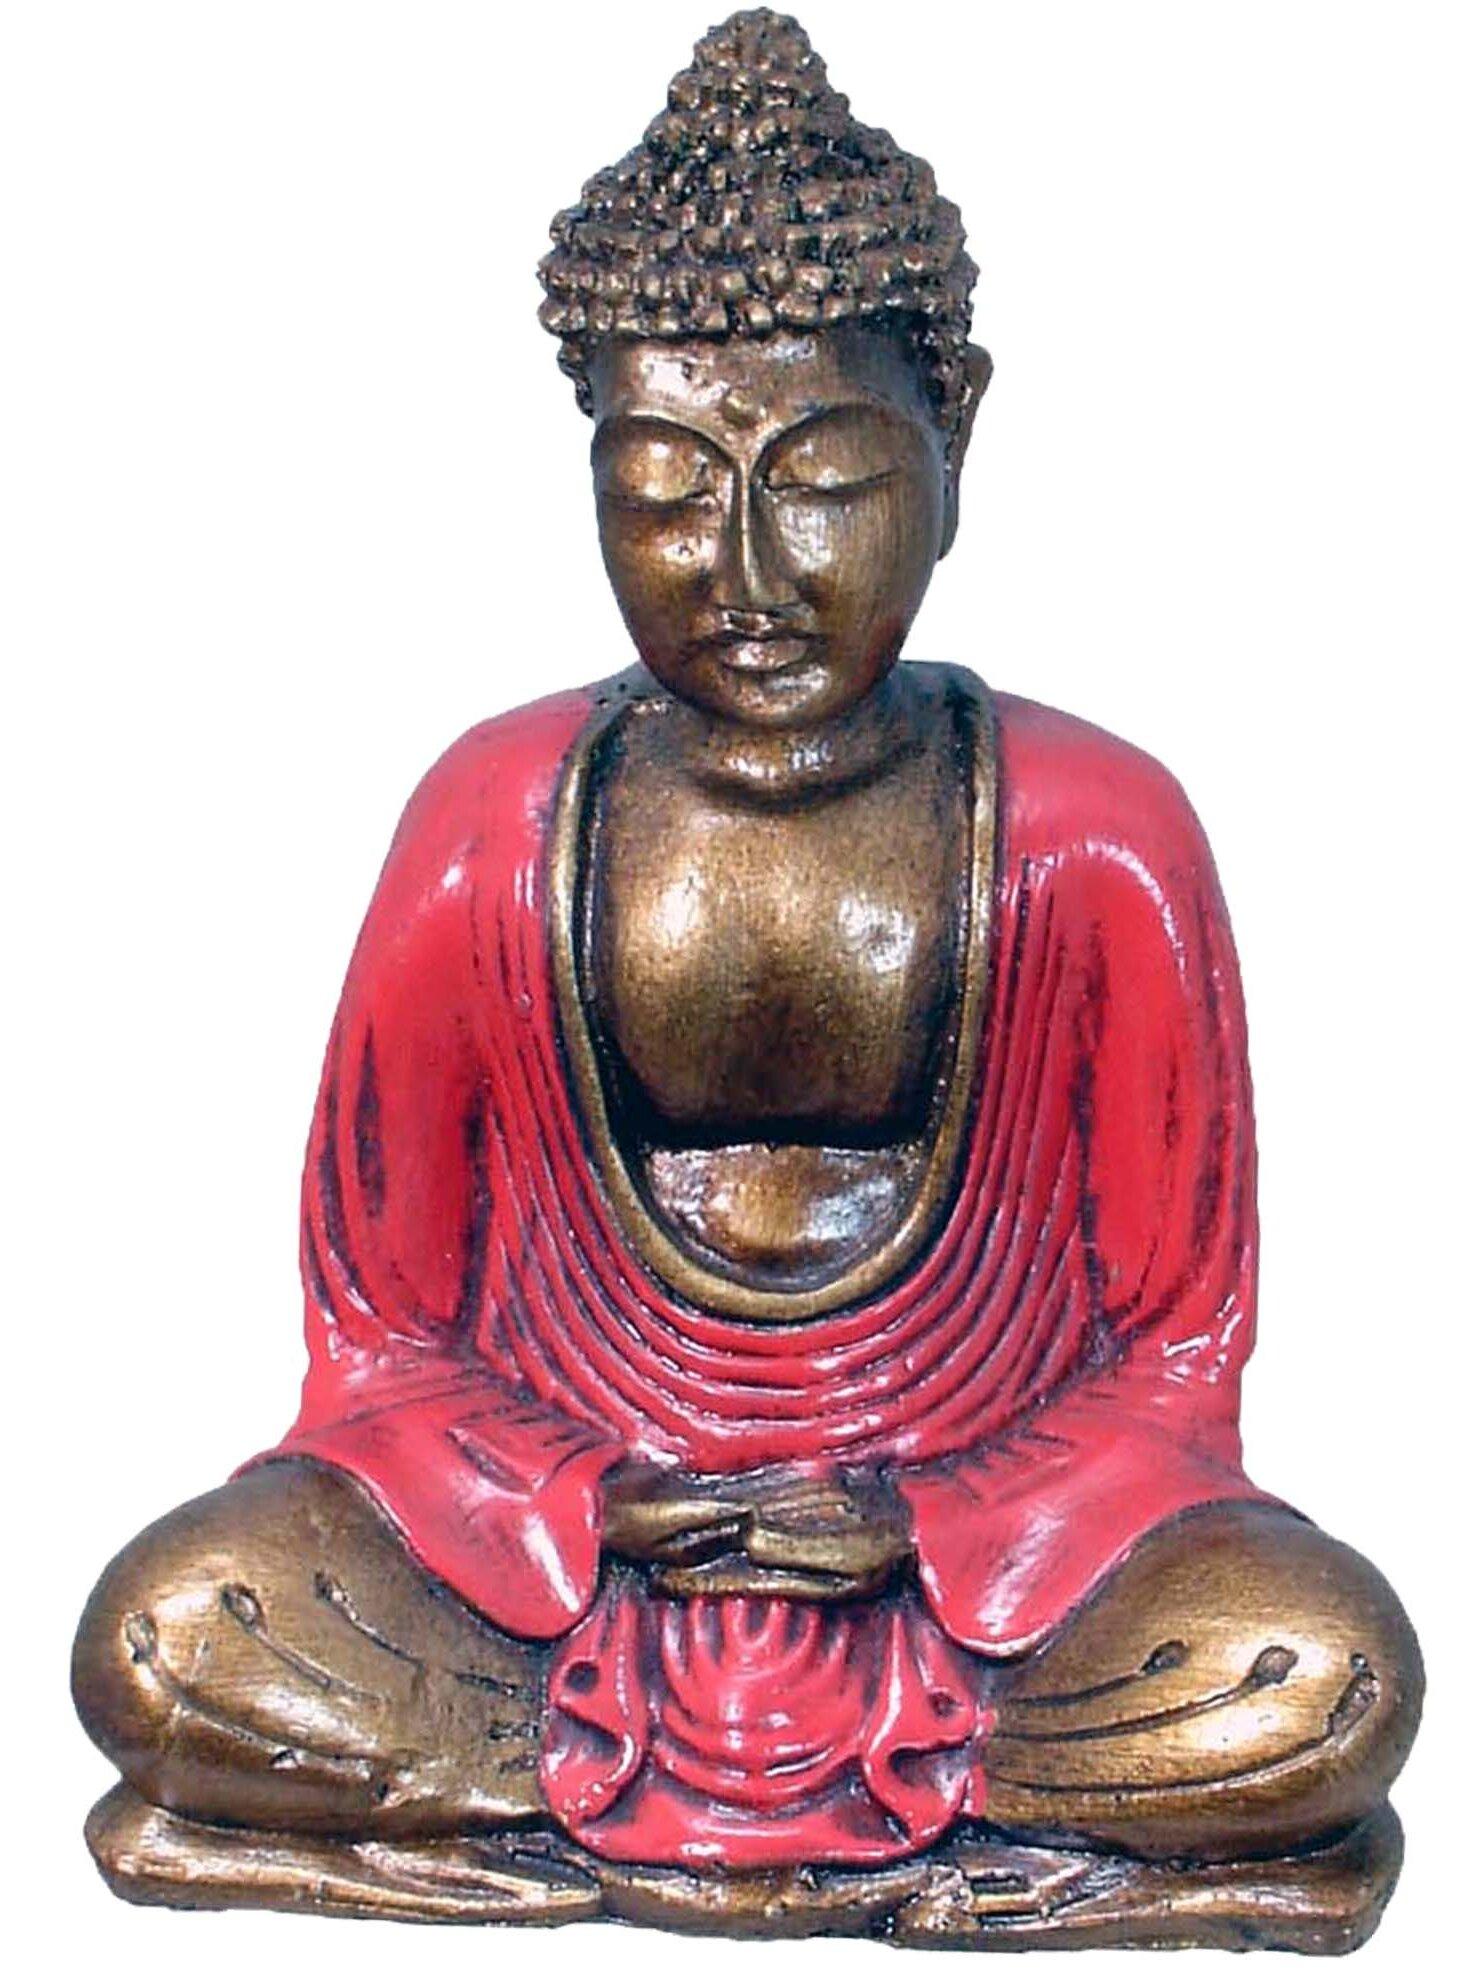 Benzara Rounded Ushnisha Head on Hands Buddha Figurine One Size Red